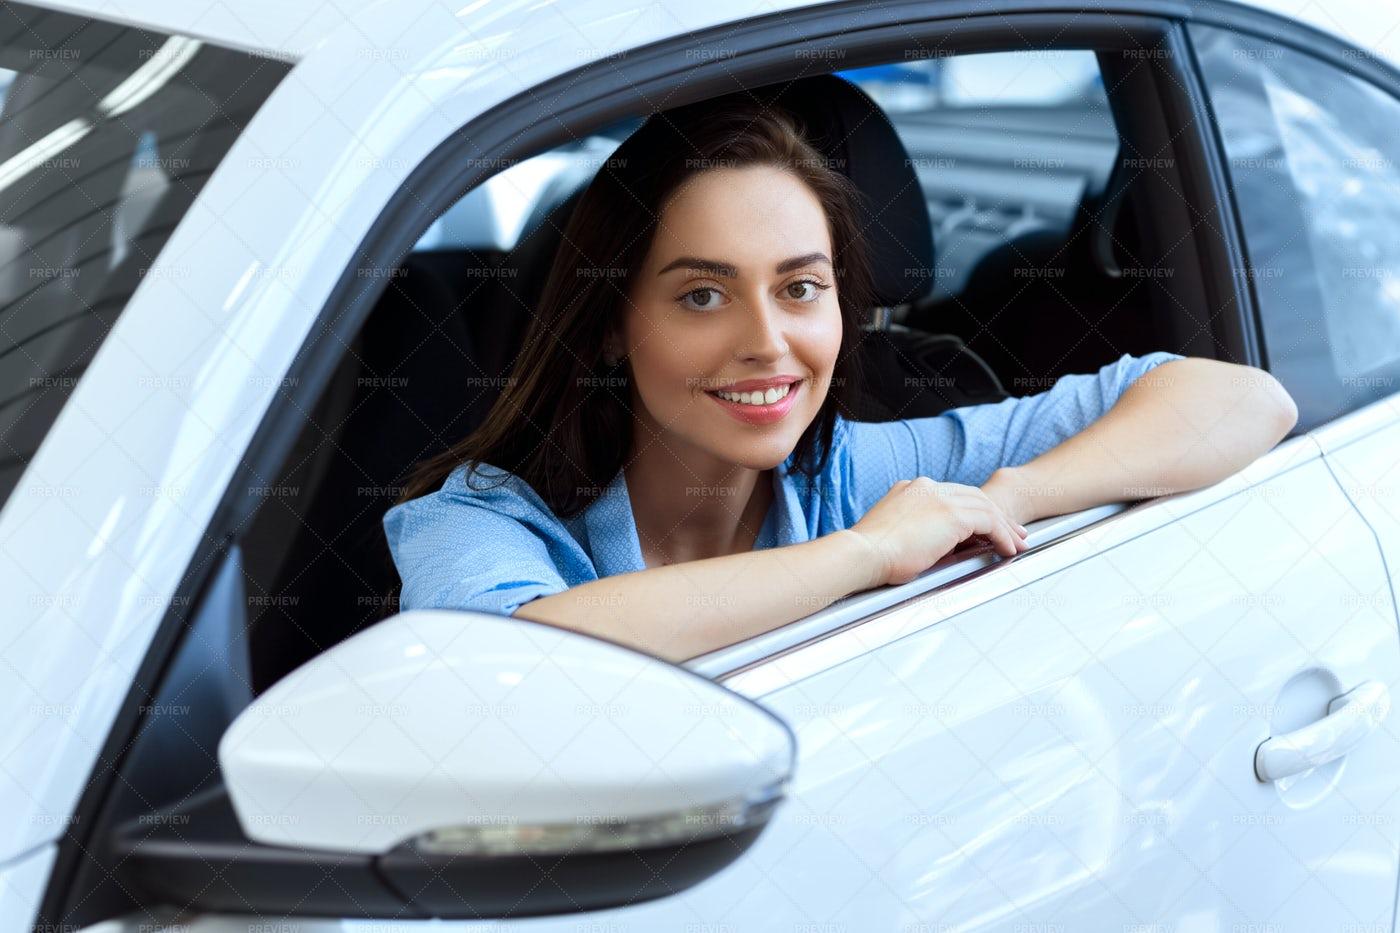 Woman In The Car: Stock Photos